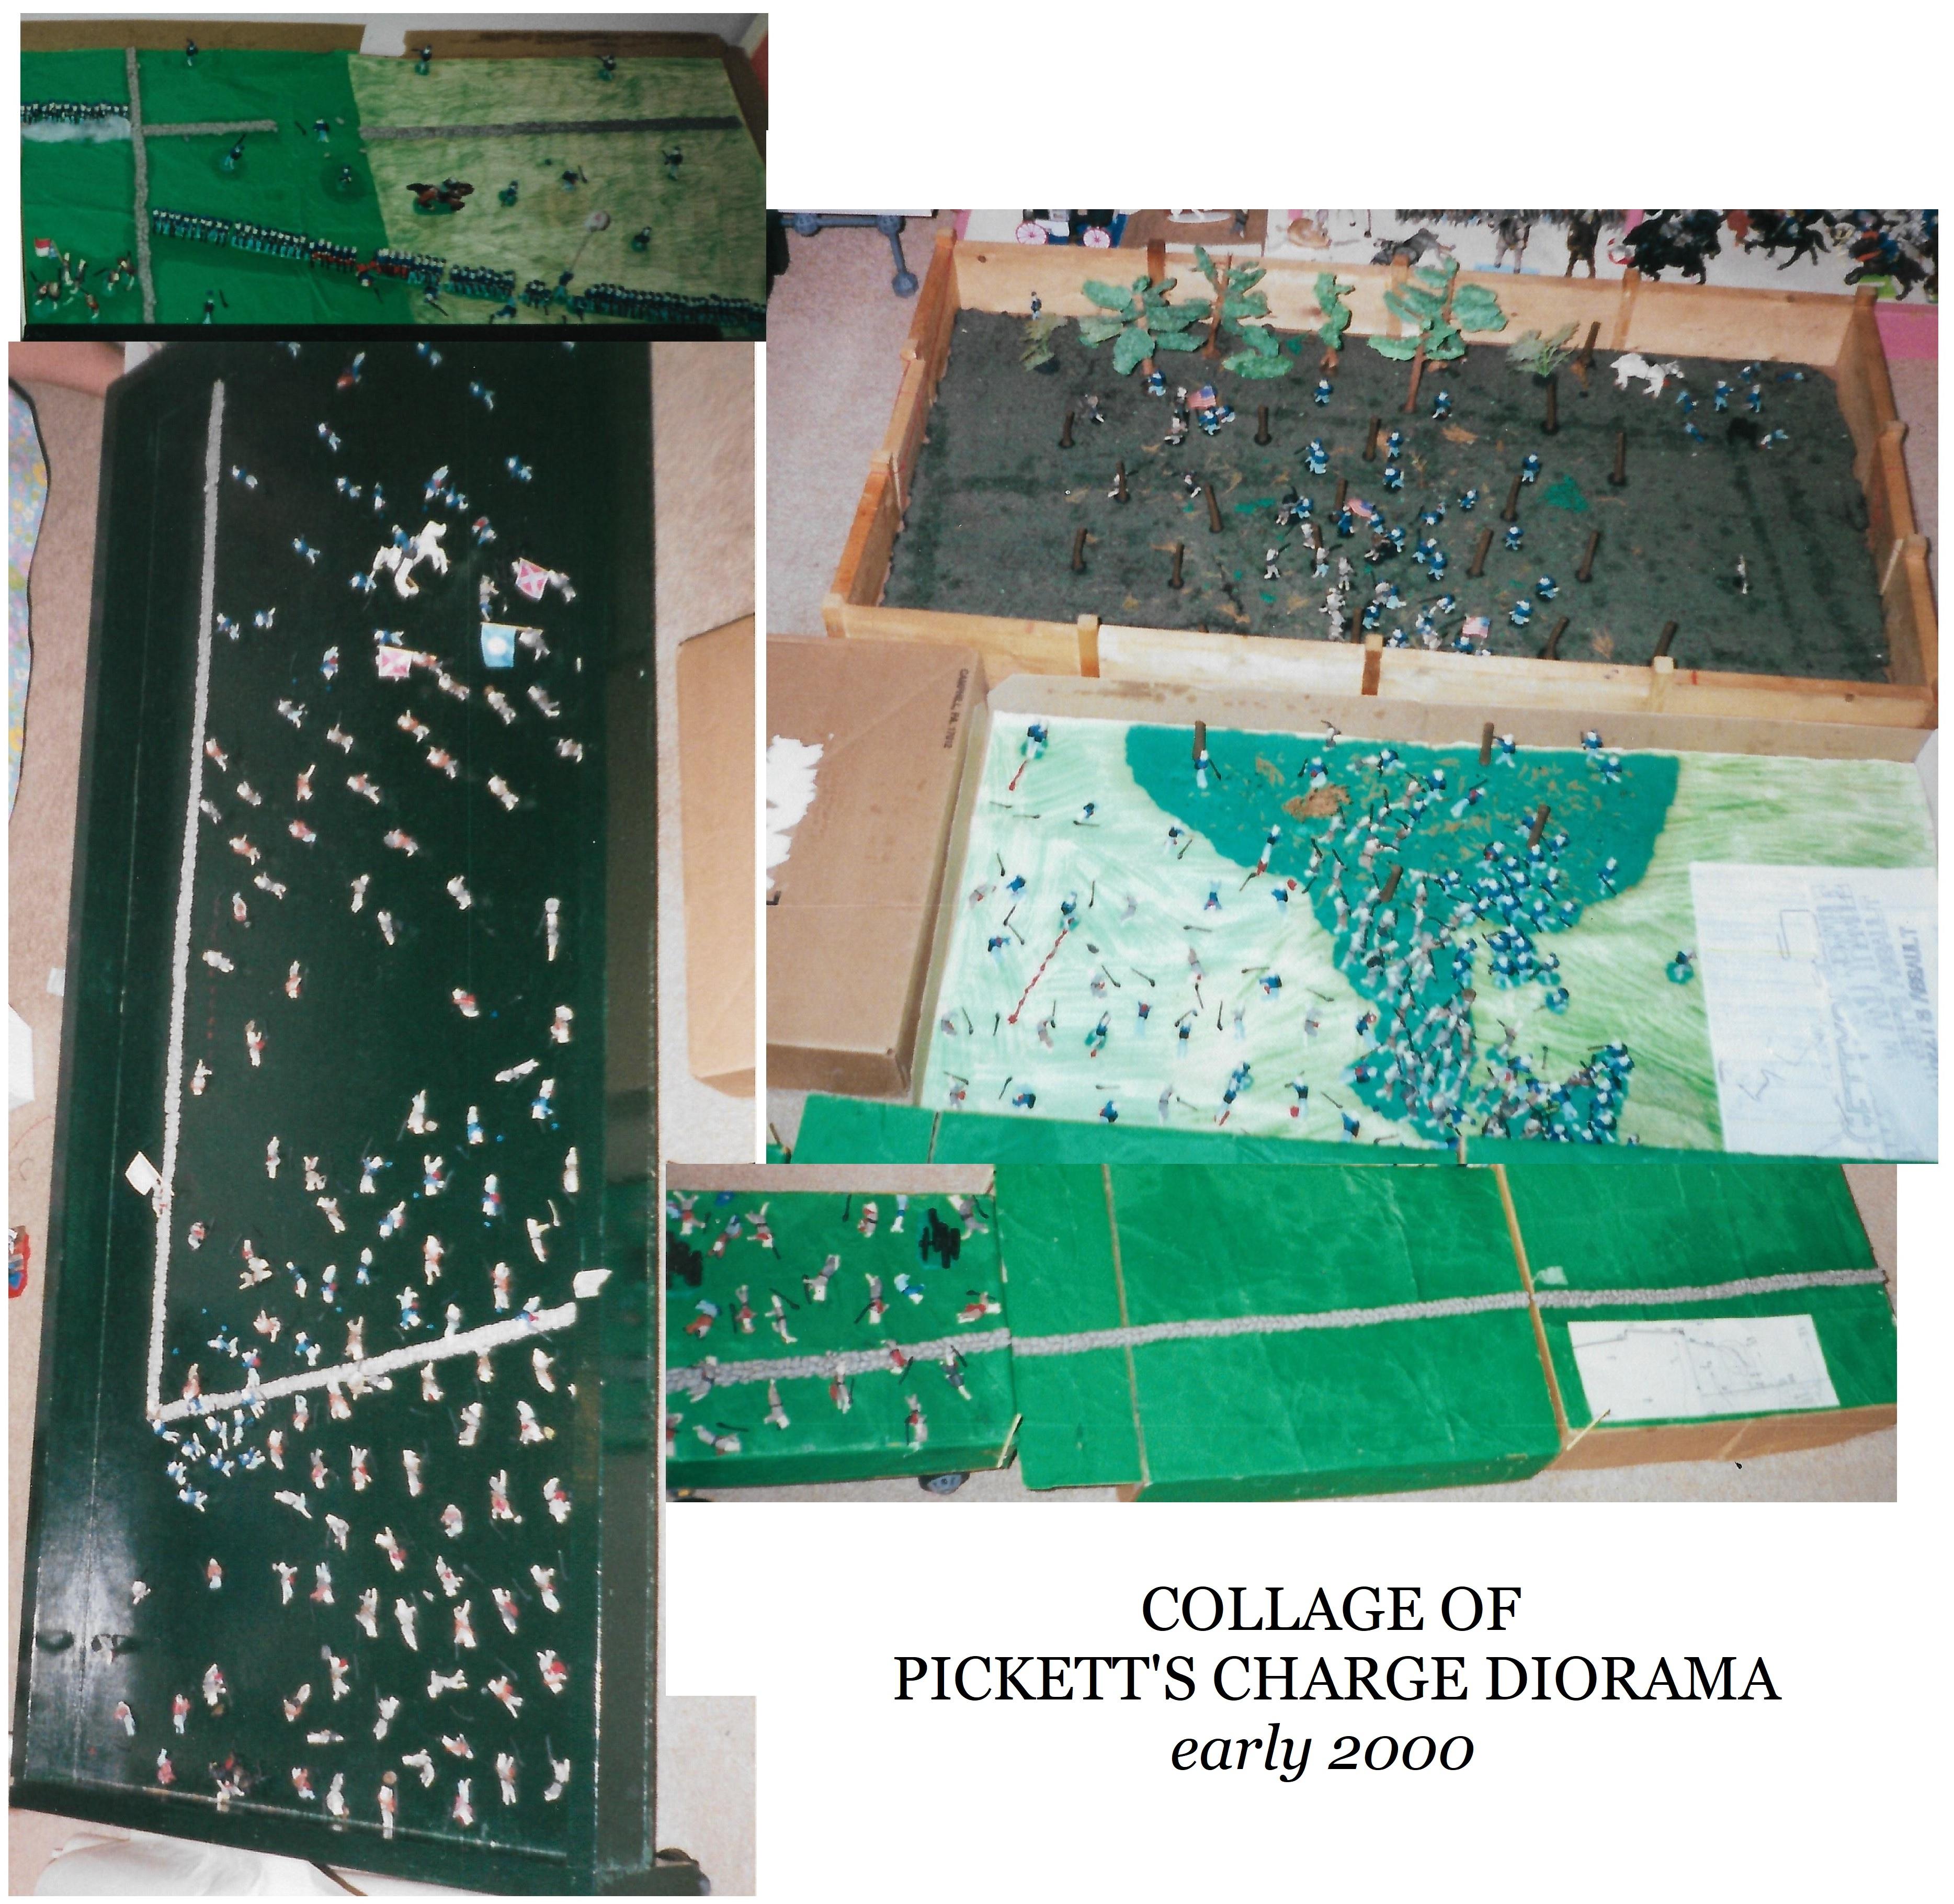 2020-08-15 PC 02 collage